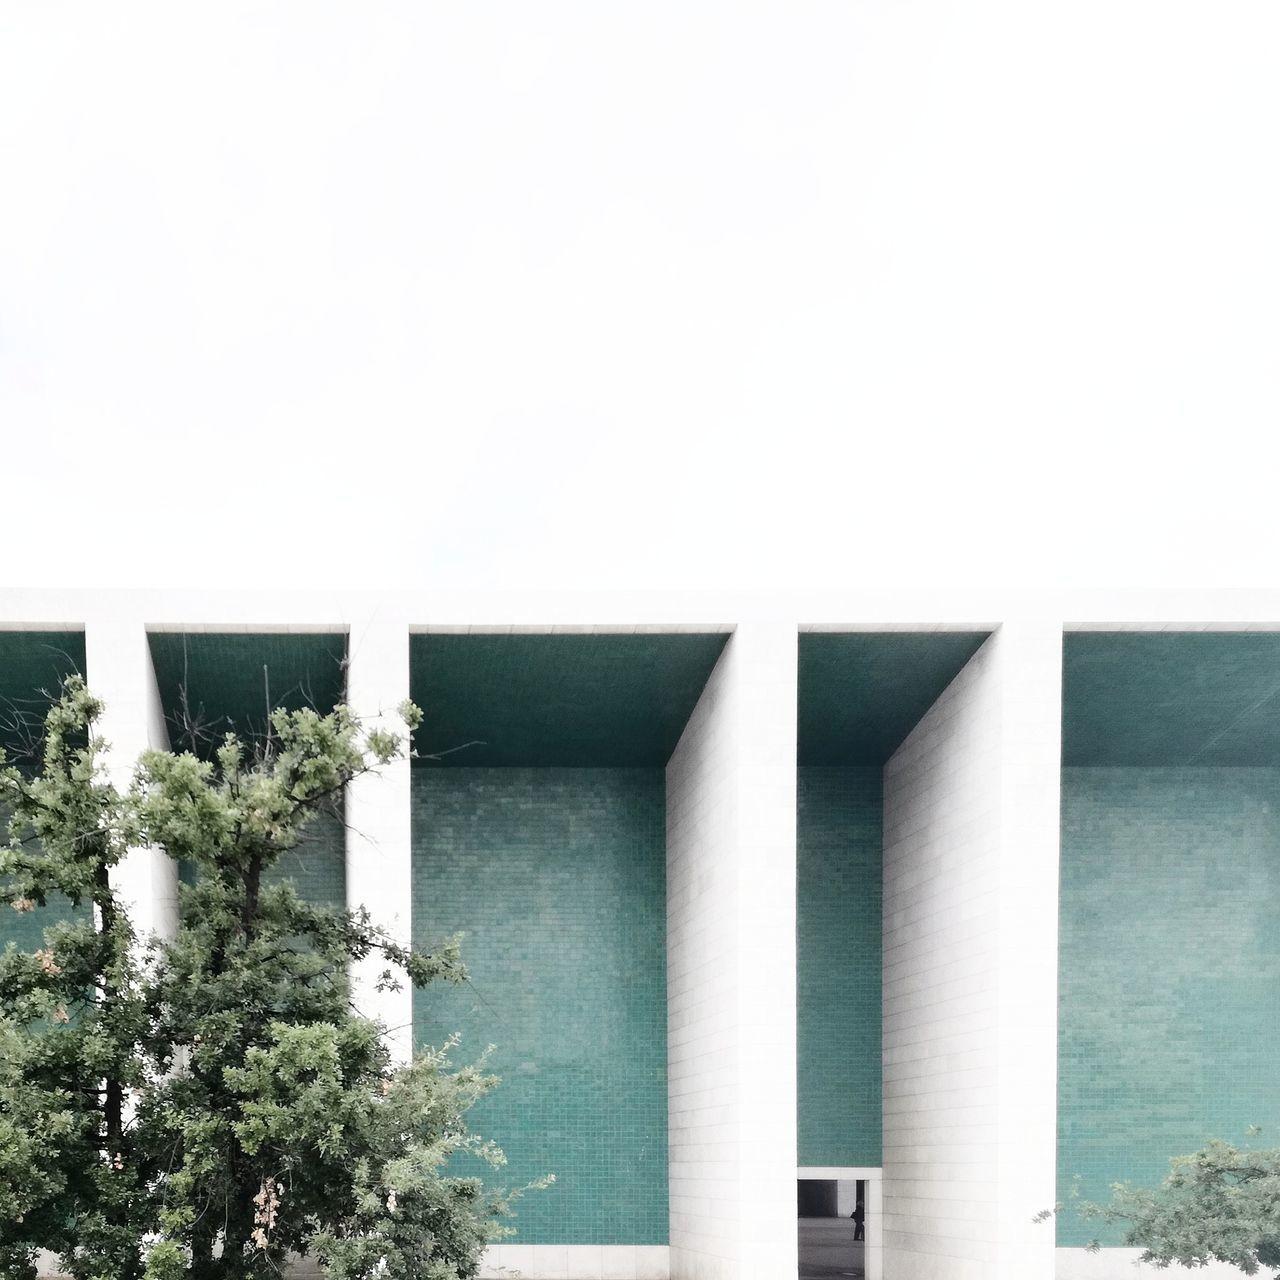 Siza Architecture Architecture_collection Minimalism Minimal Travel Graphic First Eyeem Photo